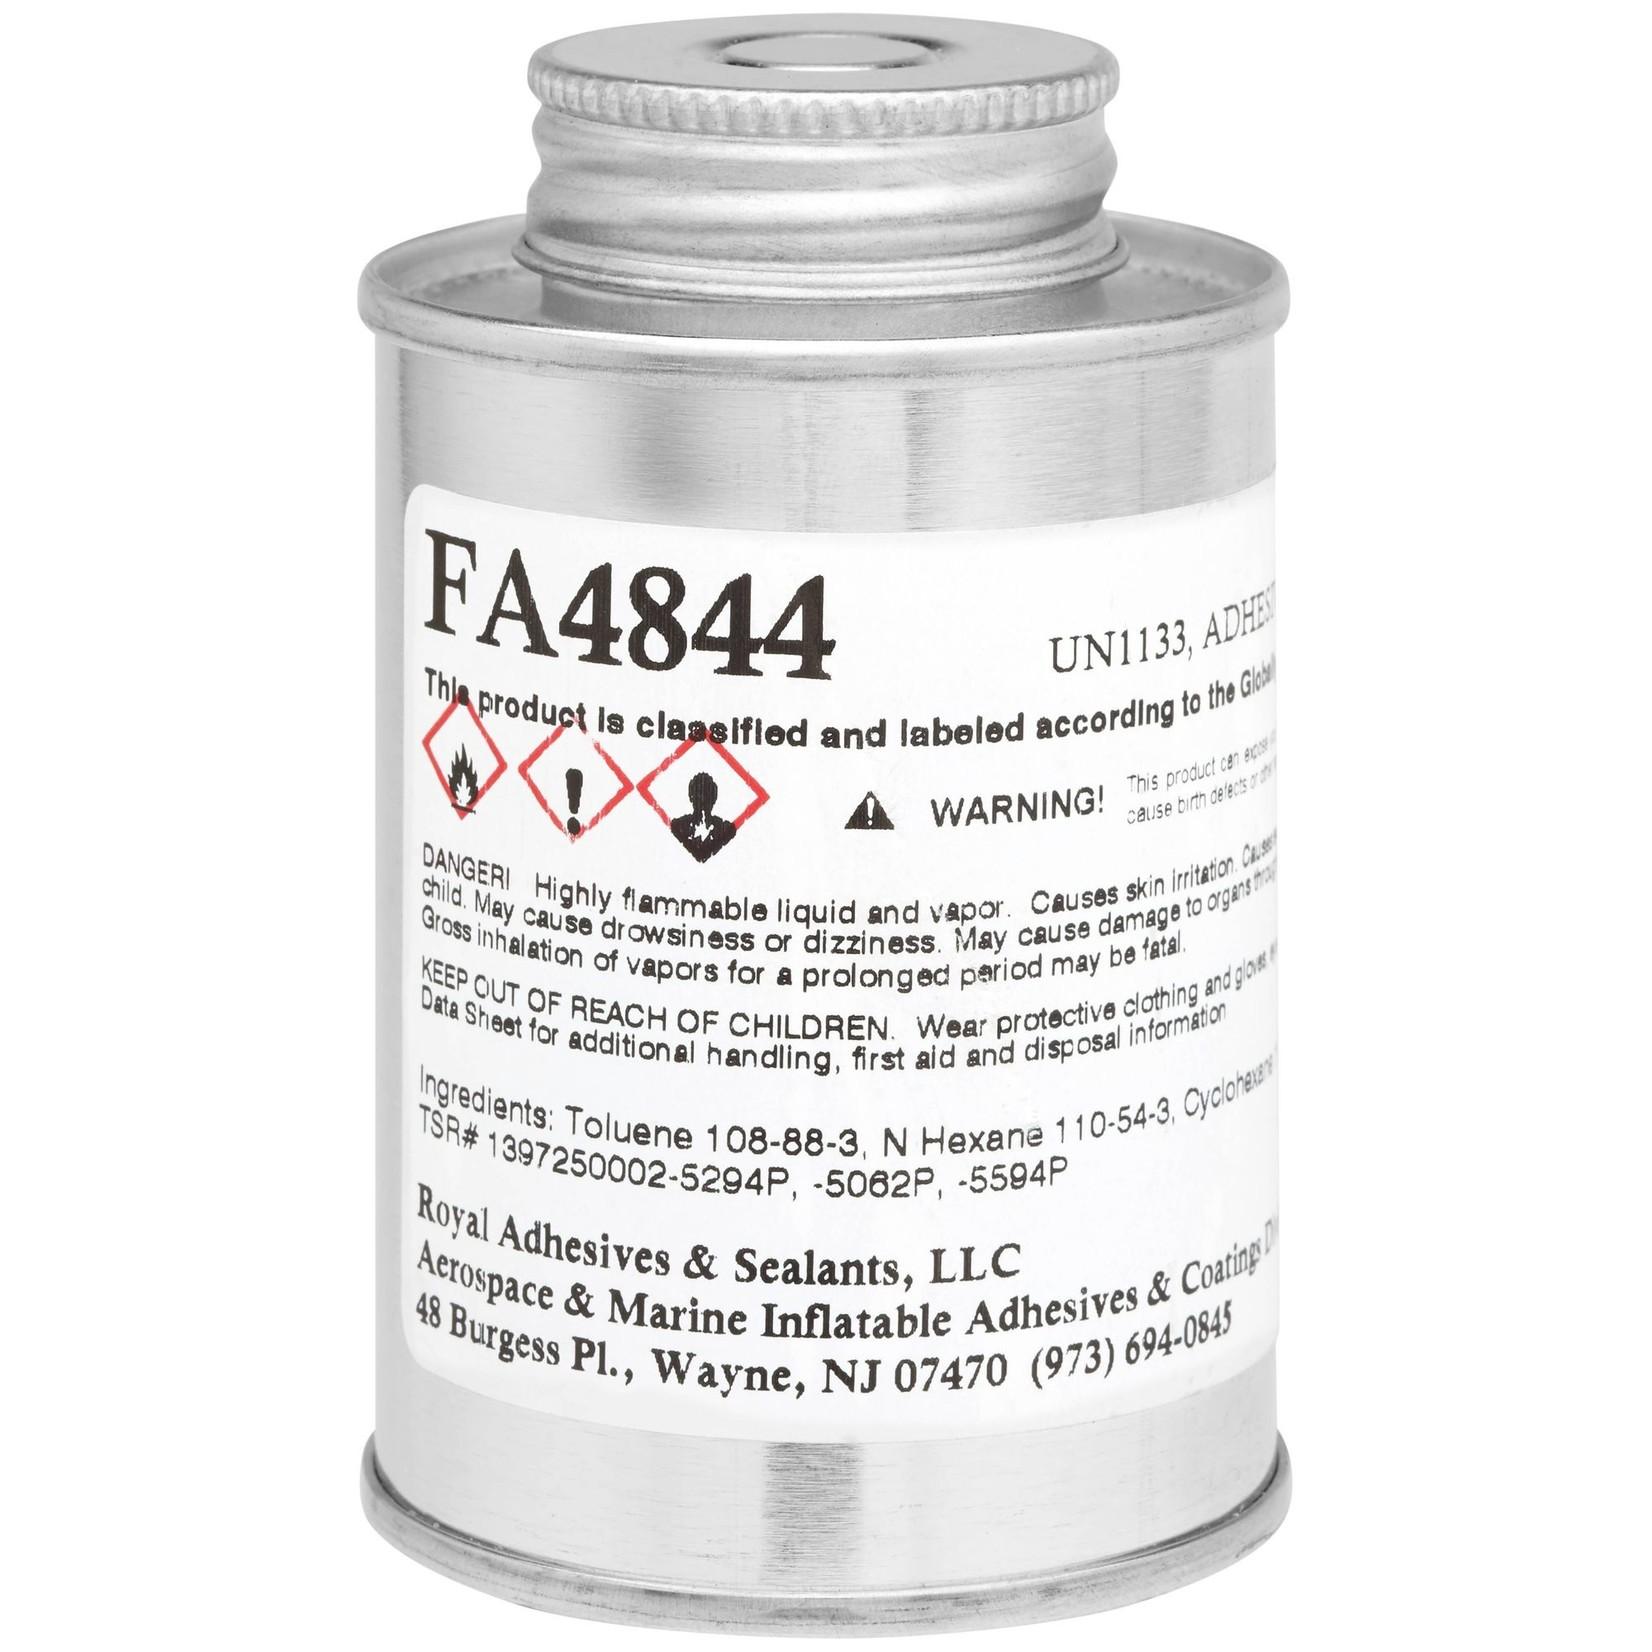 Clifton Hypalon Adhesive FA 4844